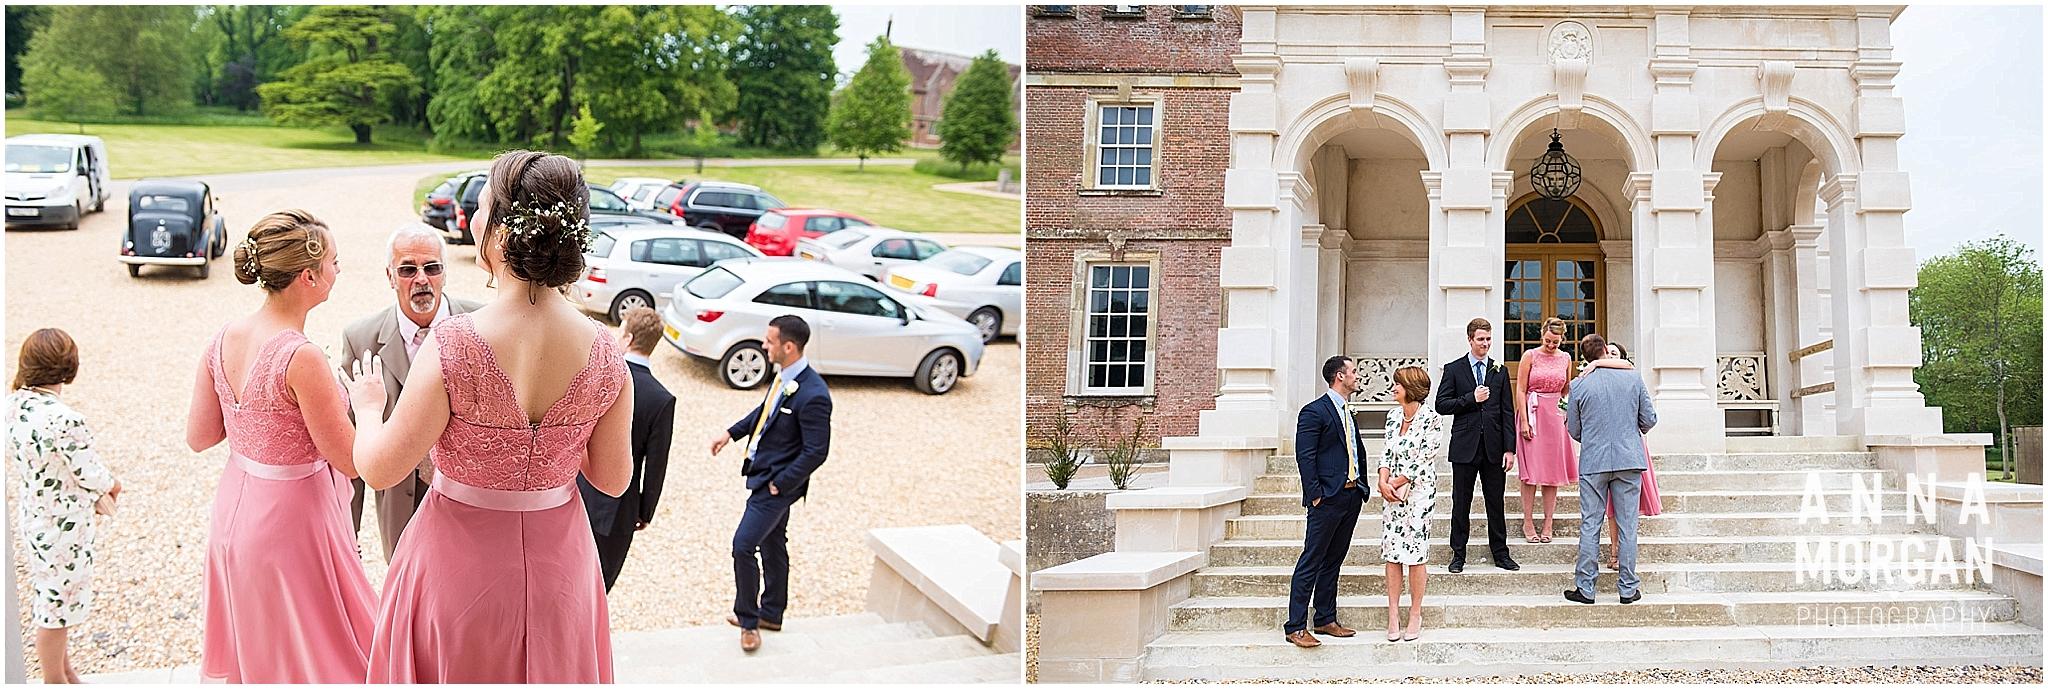 Alex & Dylan Wimborne St Giles Wedding Dorset-45